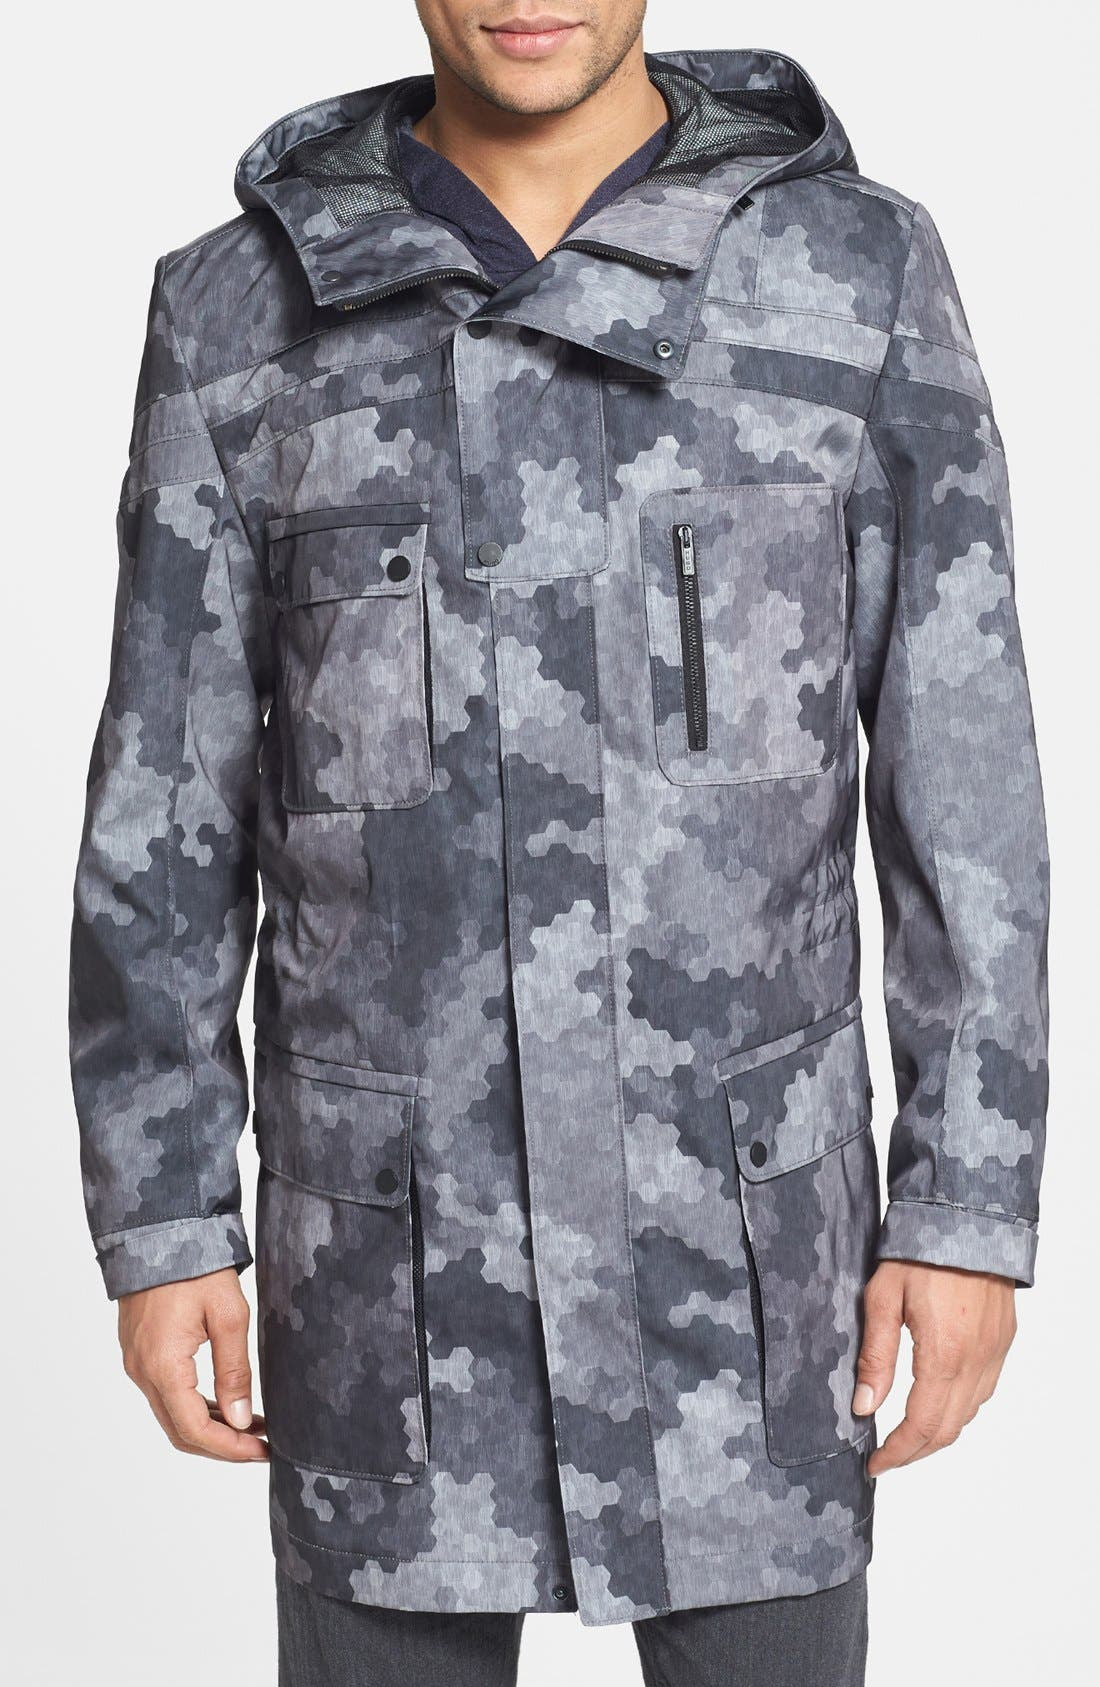 HUGO 'Meliot' Hooded Camo Trench Coat,                         Main,                         color, Grey Camo